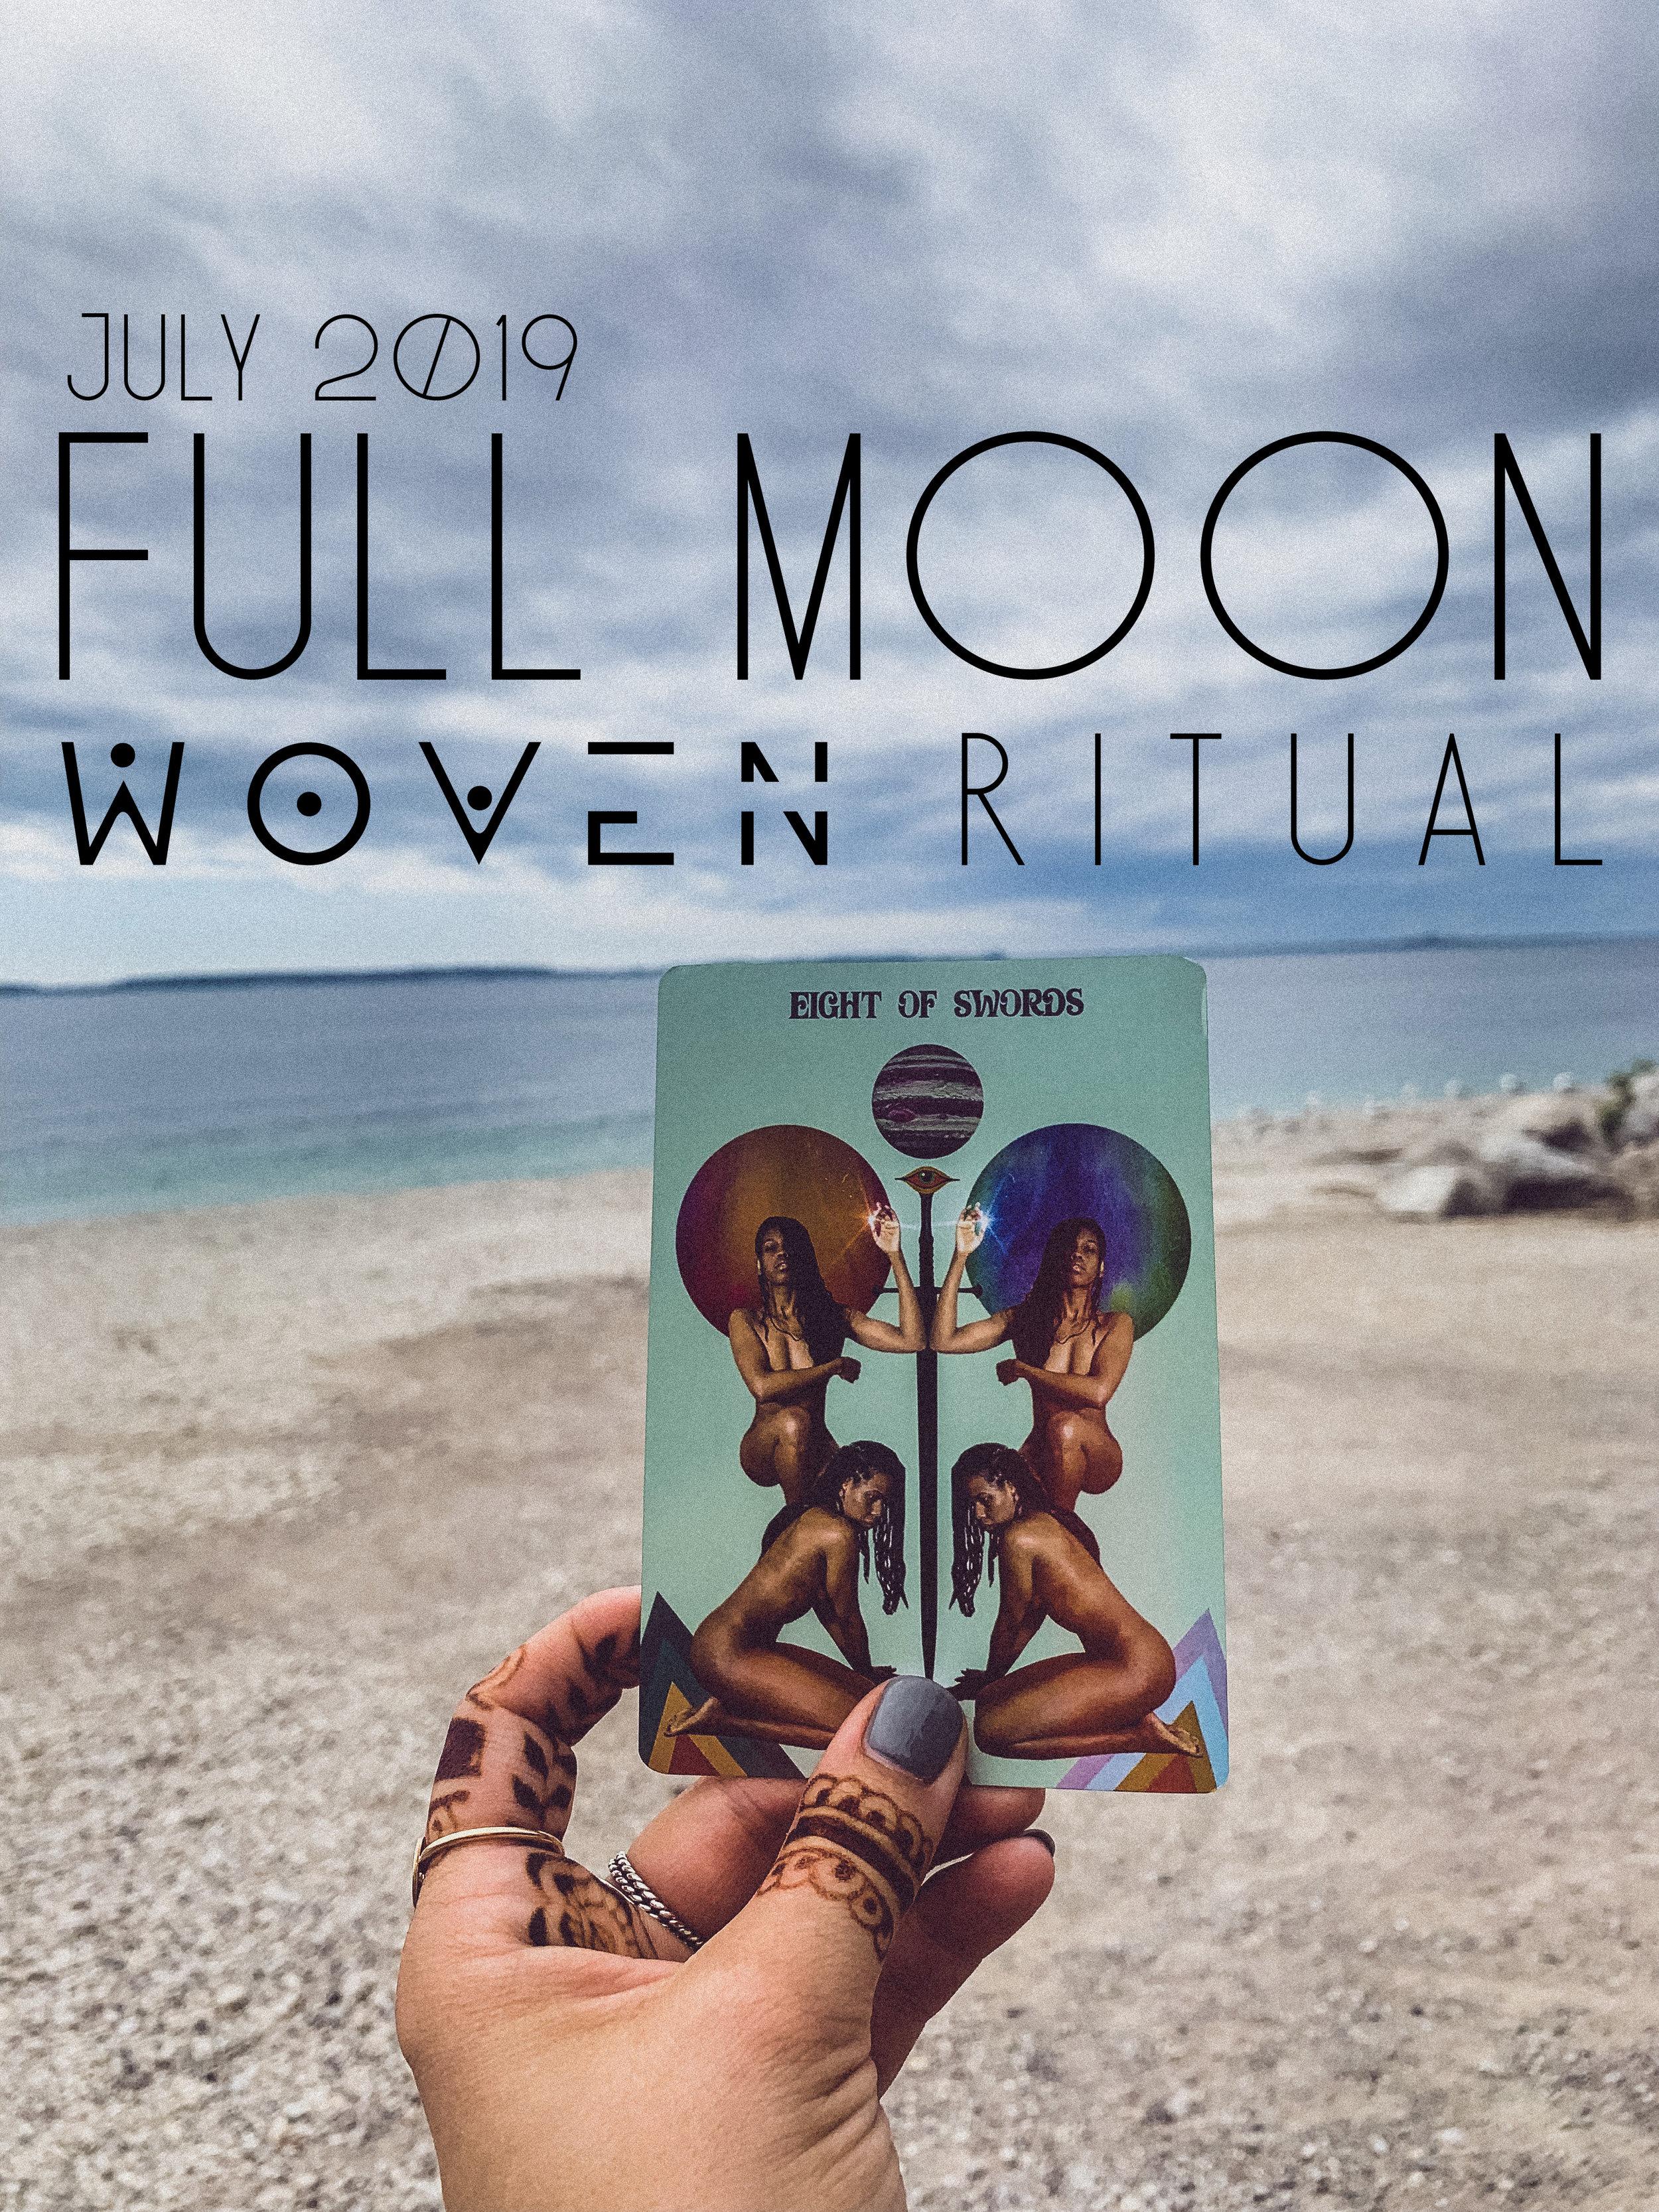 8 of swords for Full Moon + Lunar Eclipse July 2019